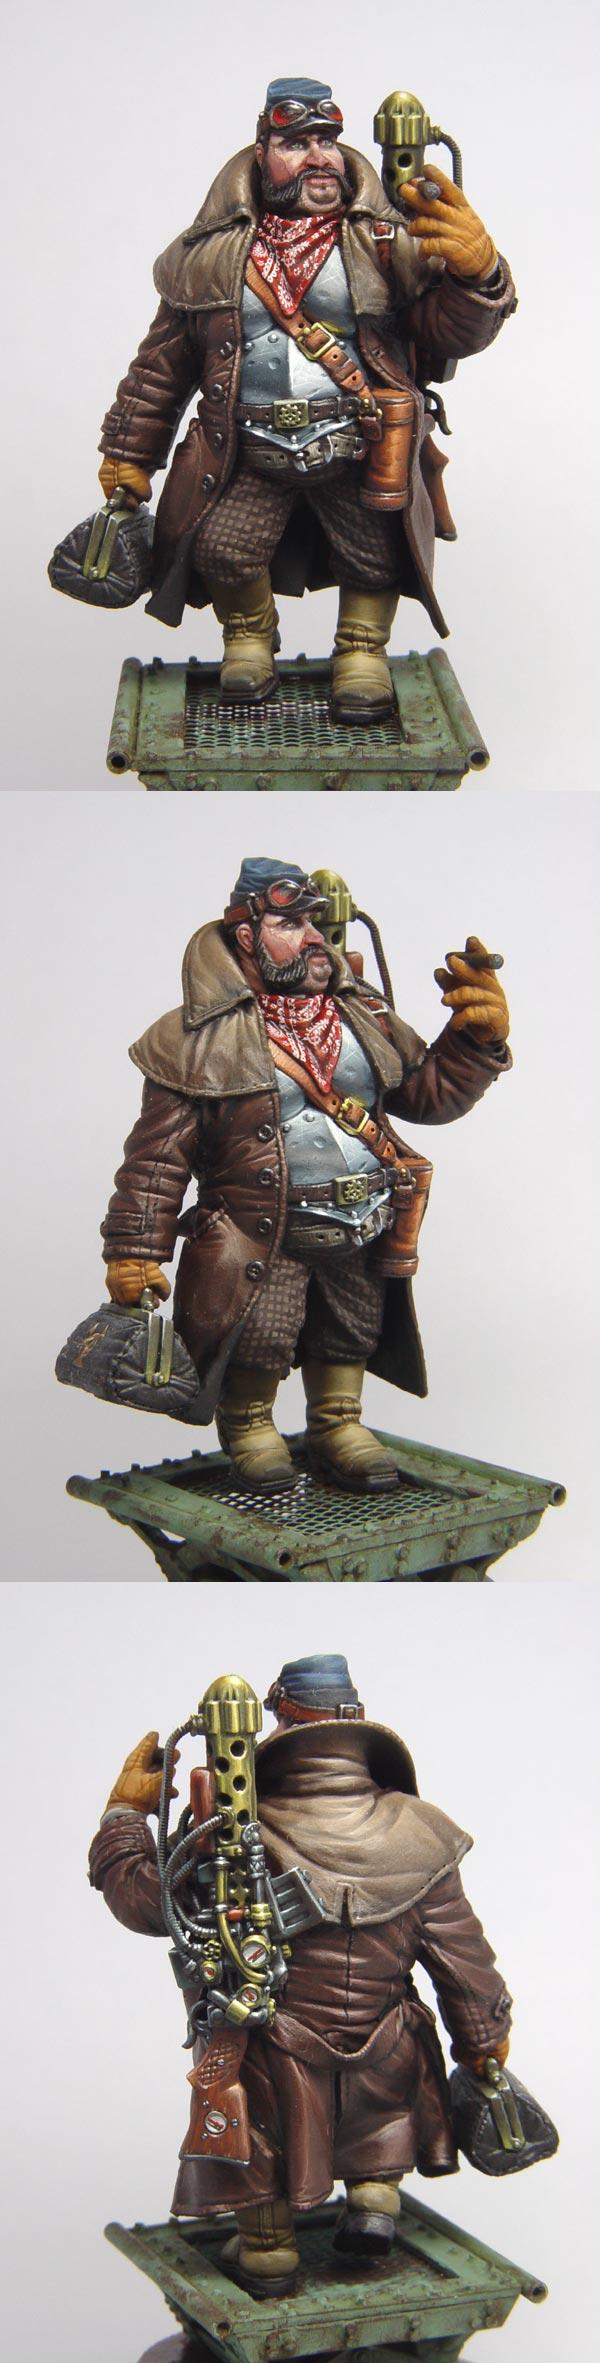 Steampunk ogre archeologist